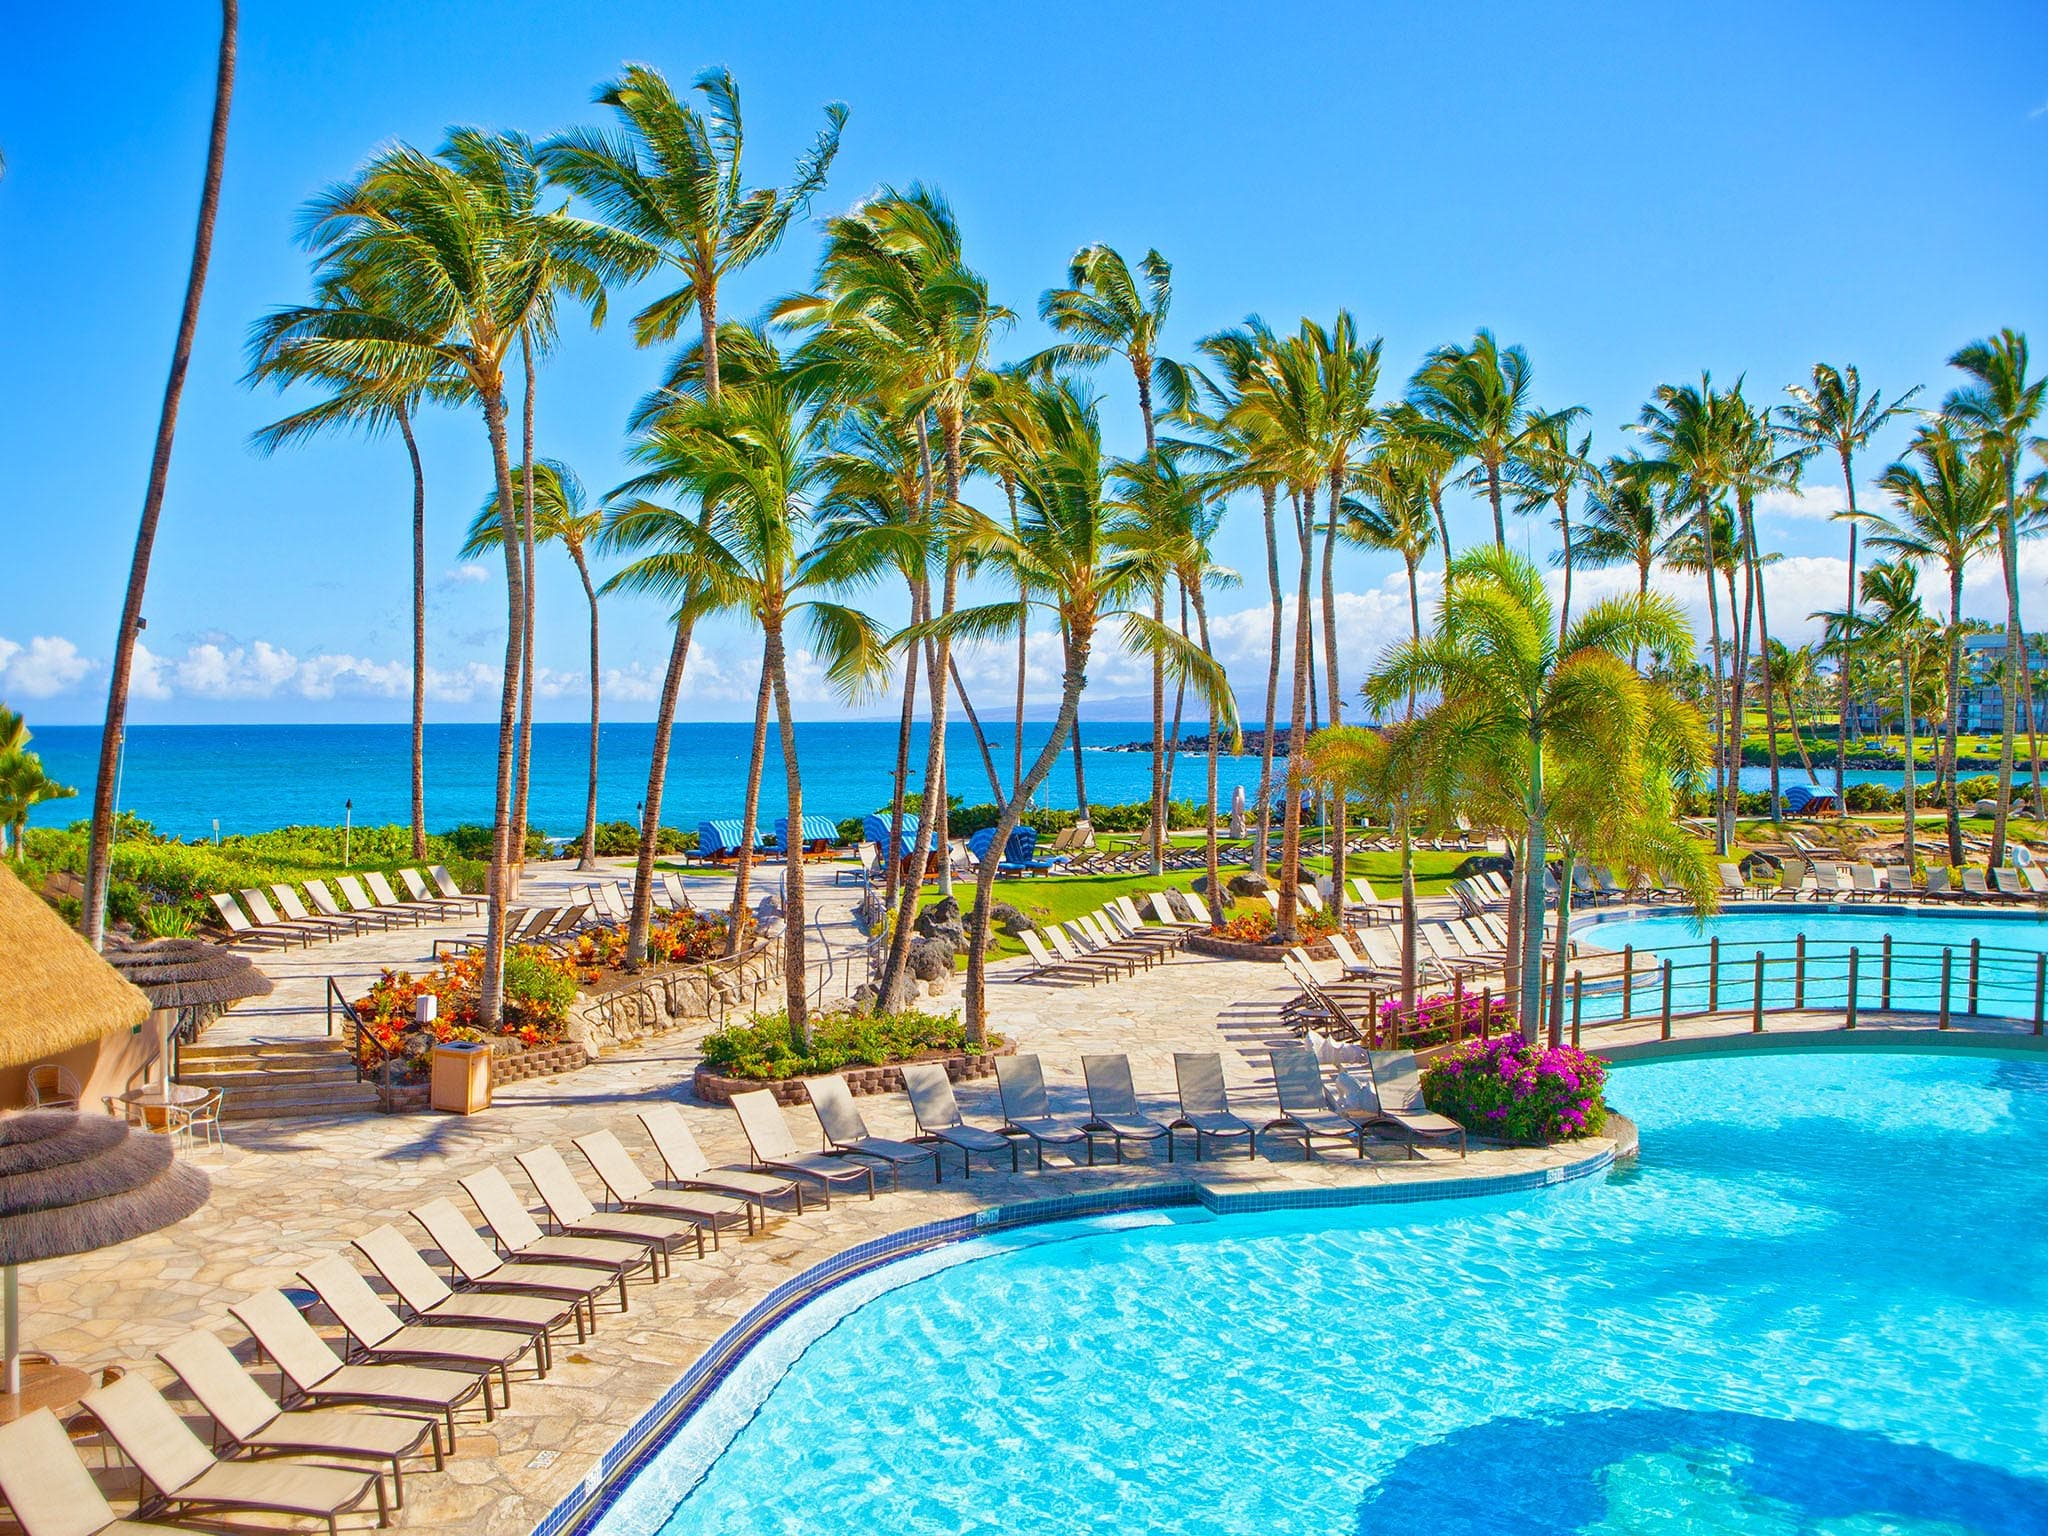 Hilton_Waikoloa_pool.jpg